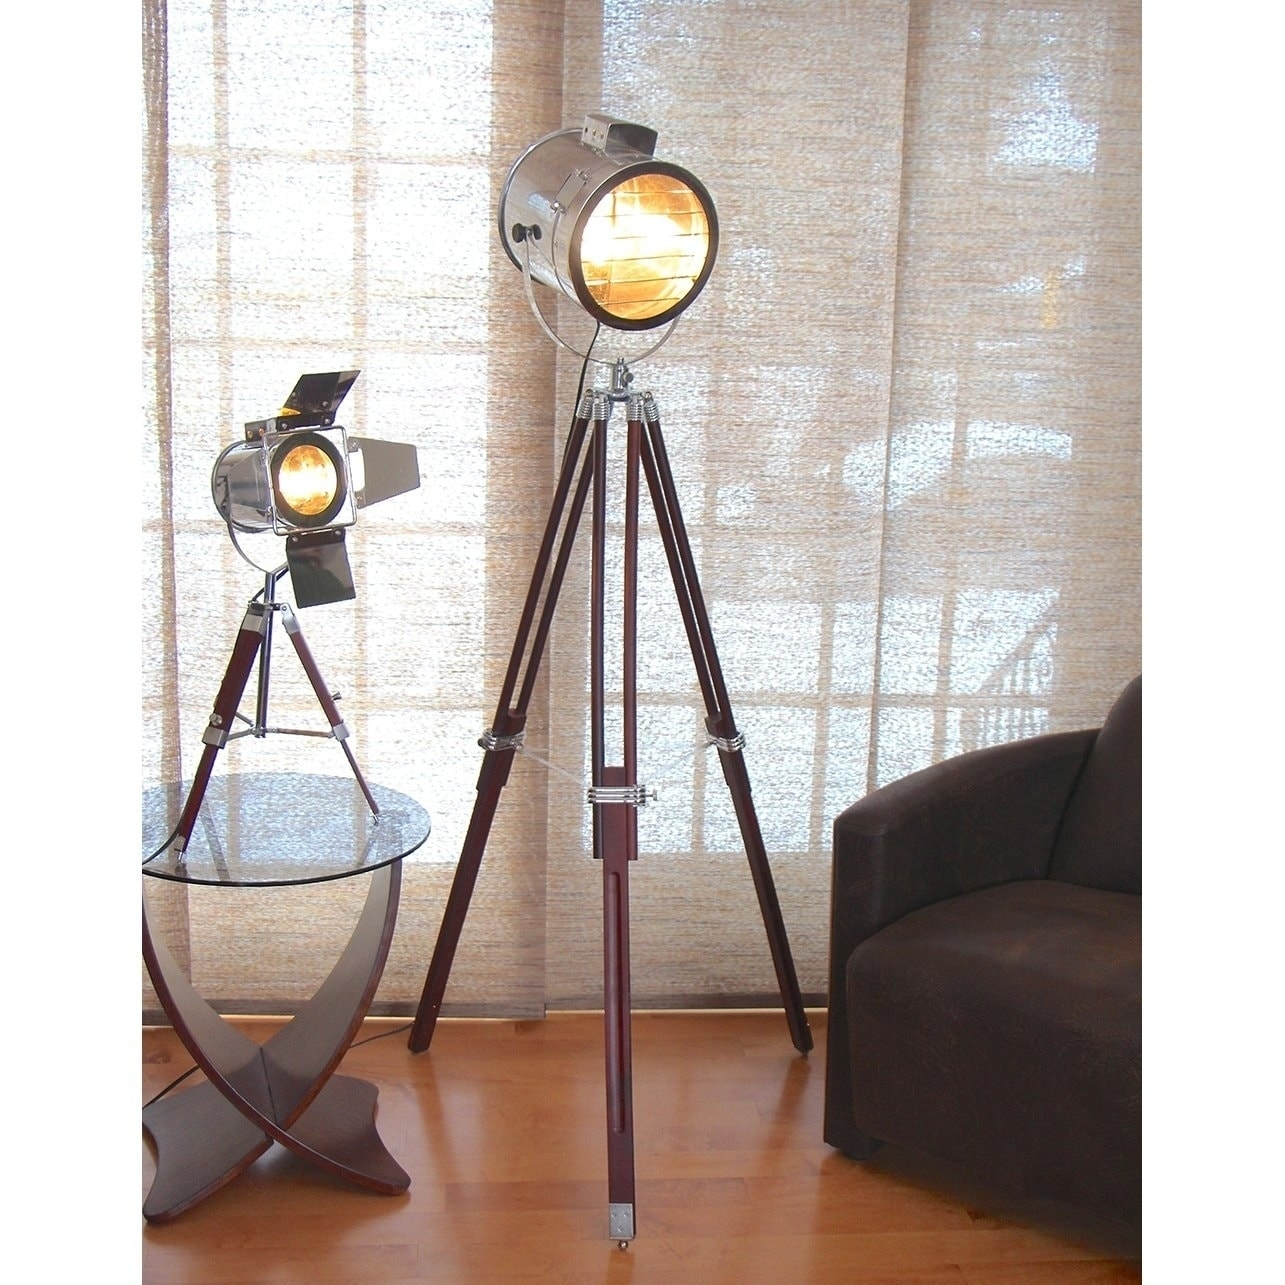 Floor Lamps Spotlight Central 2020 @house2homegoods.net